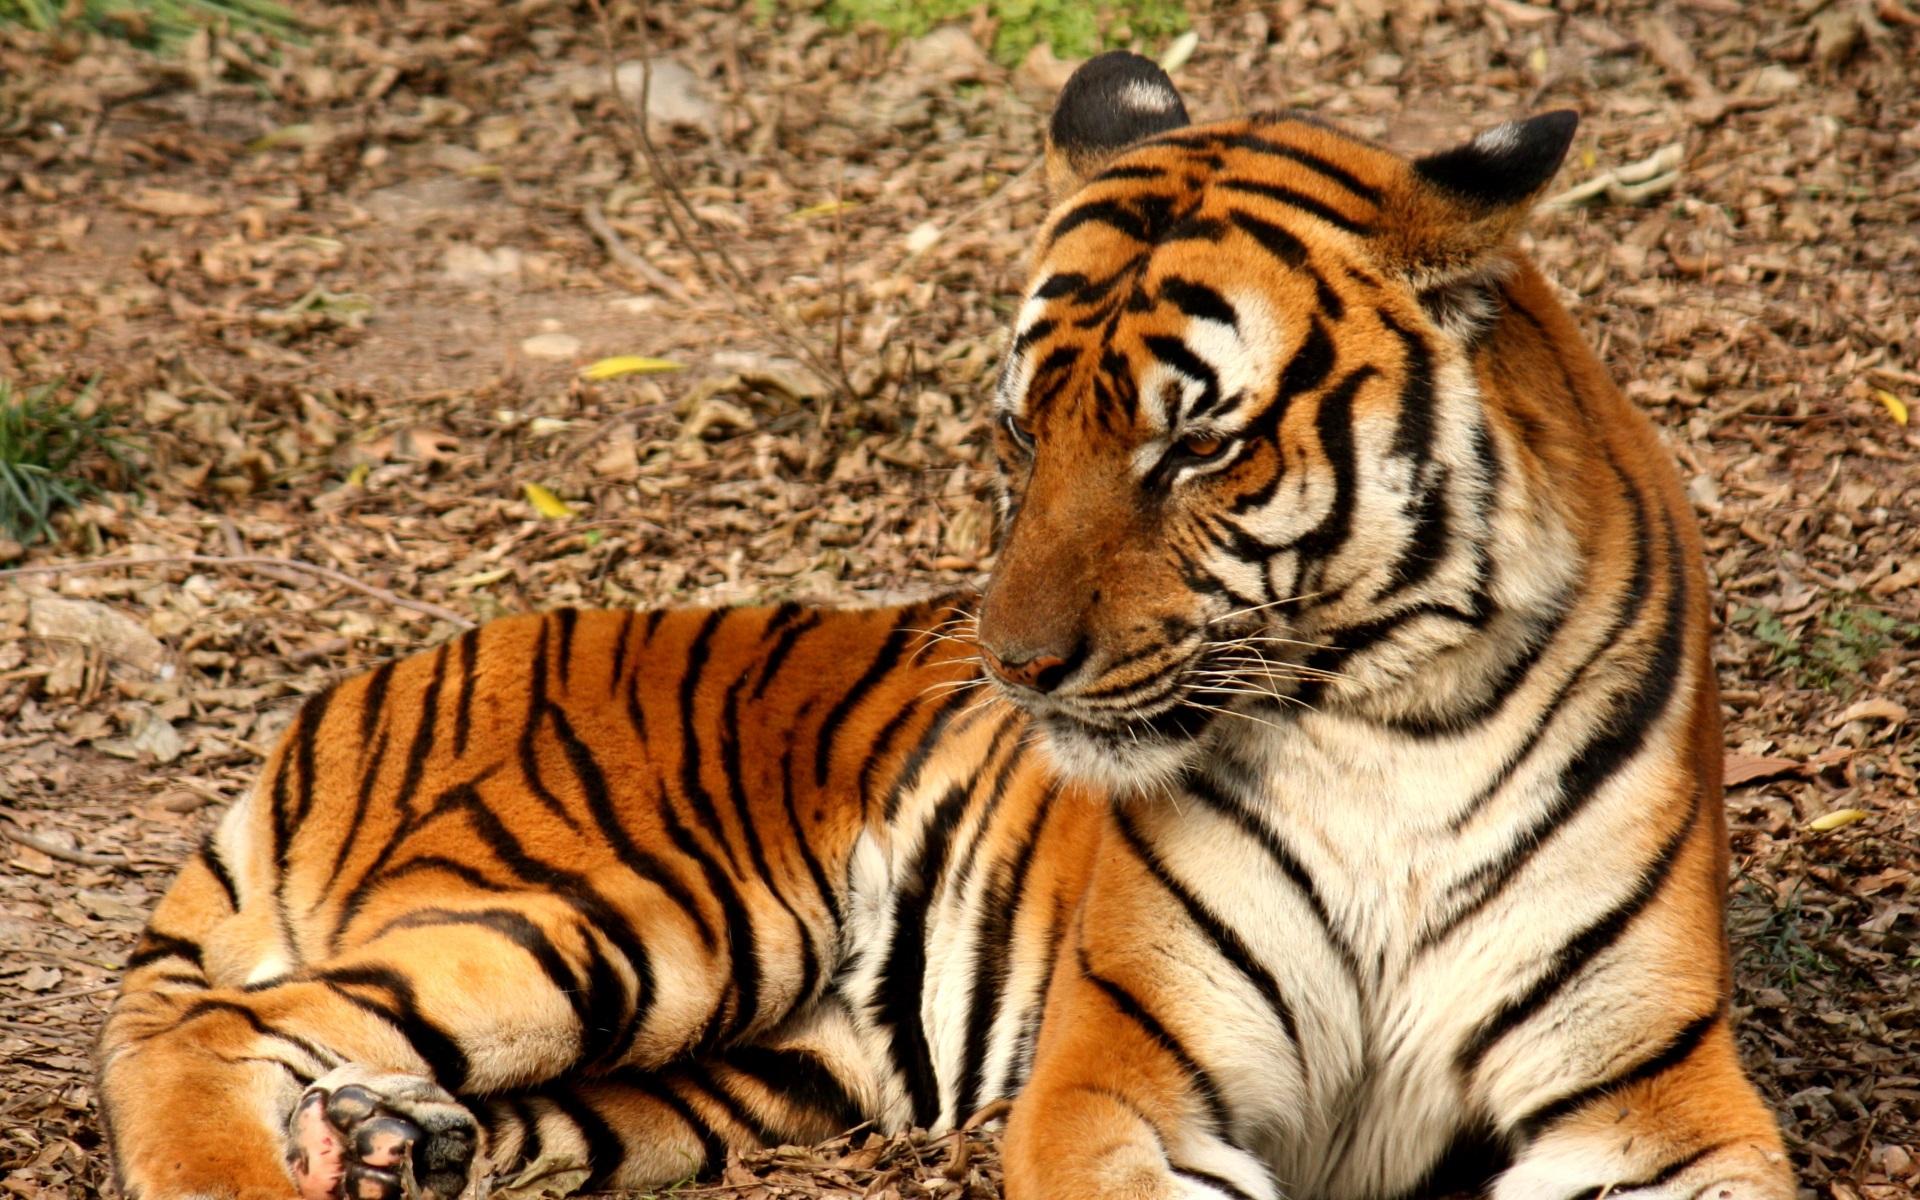 Tiger photo via Wikipedia 2012_Suedchinesischer_Tiger-wikipedia-1920